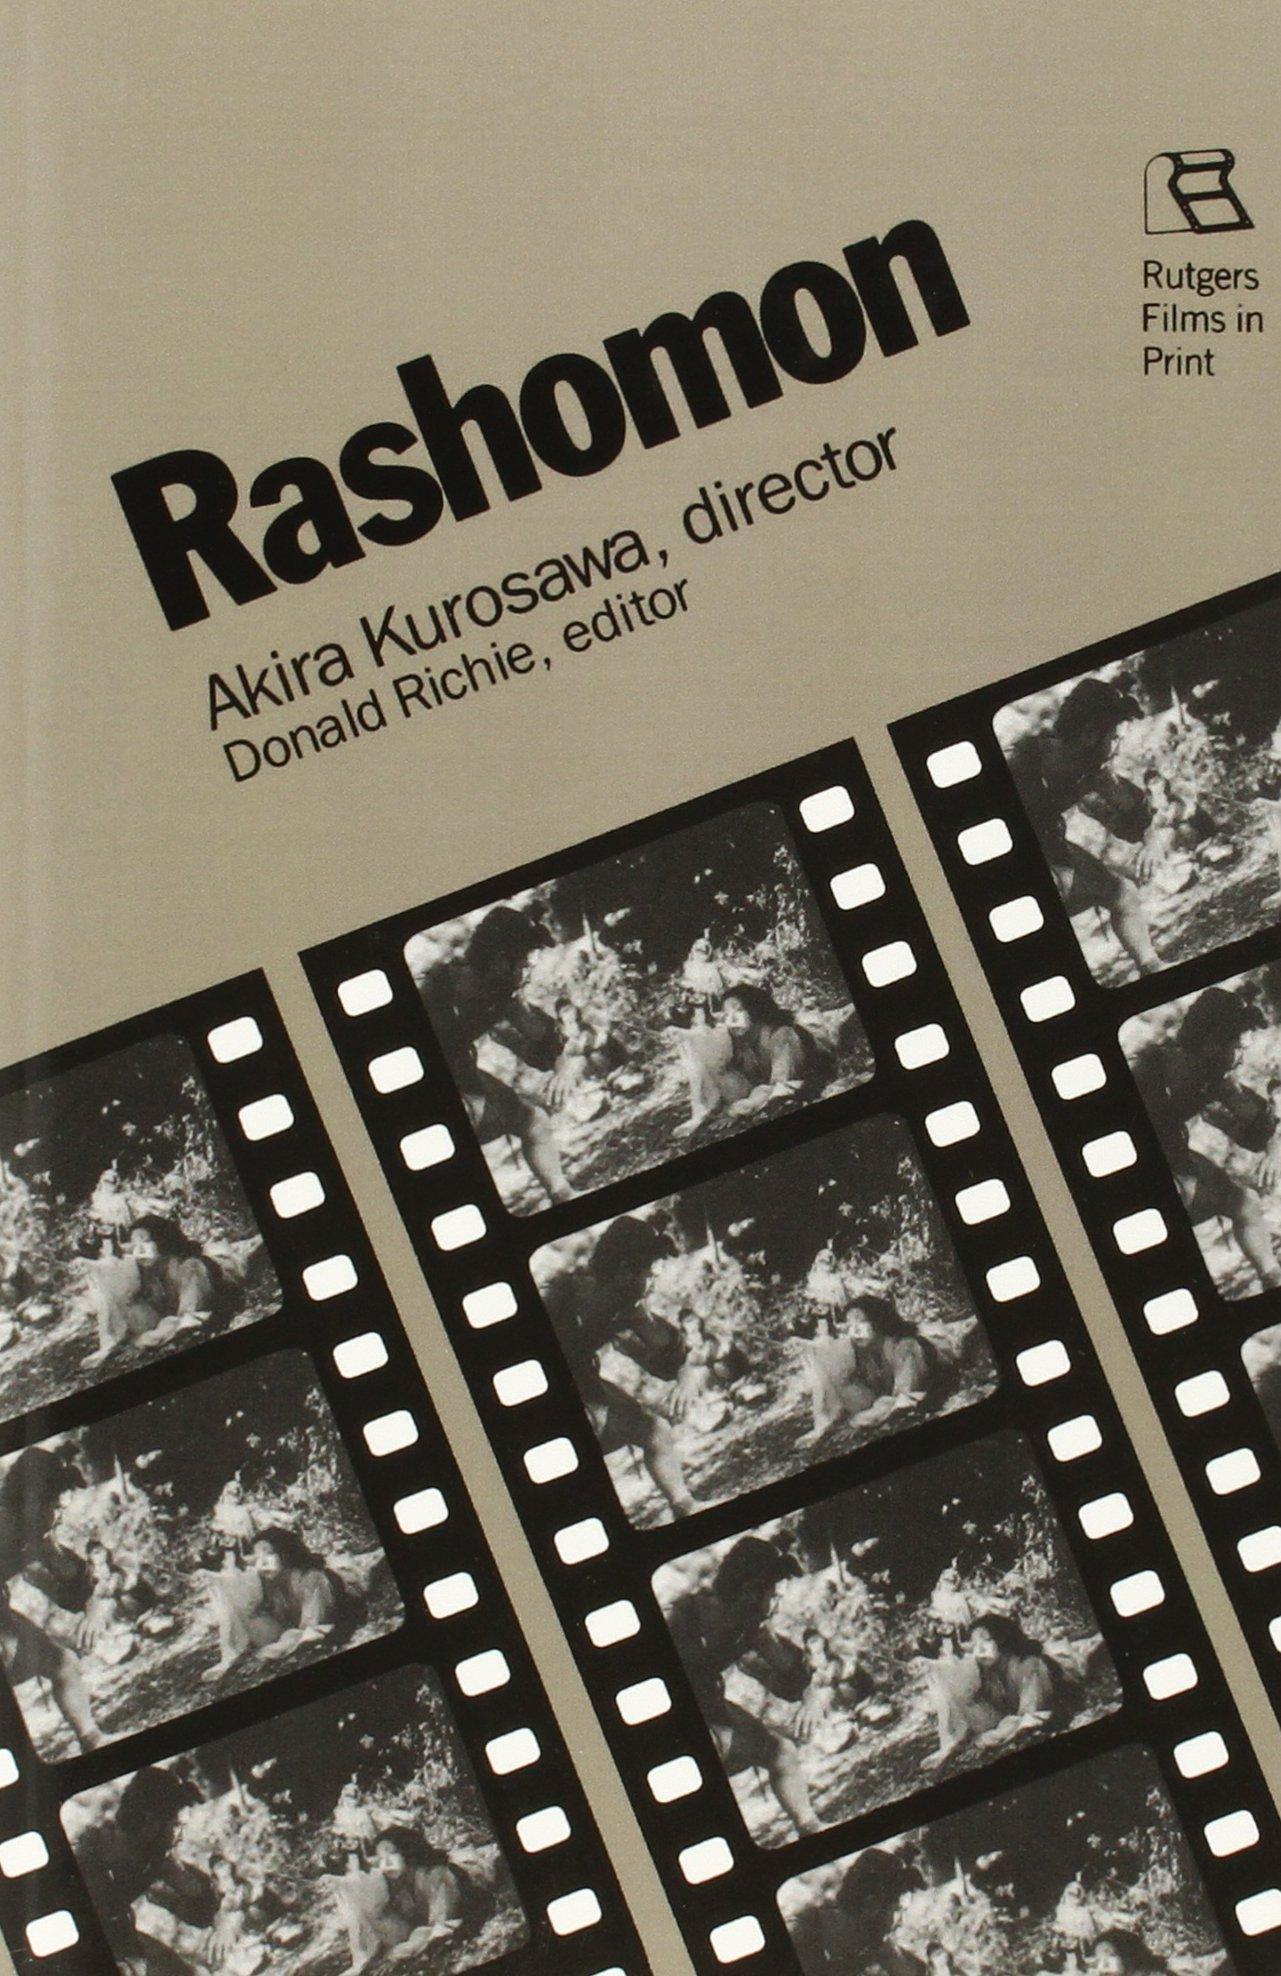 rashomon akira kurosawa director rutgers films in print series rashomon akira kurosawa director rutgers films in print series akira kurosawa donald richie 9780813511801 com books